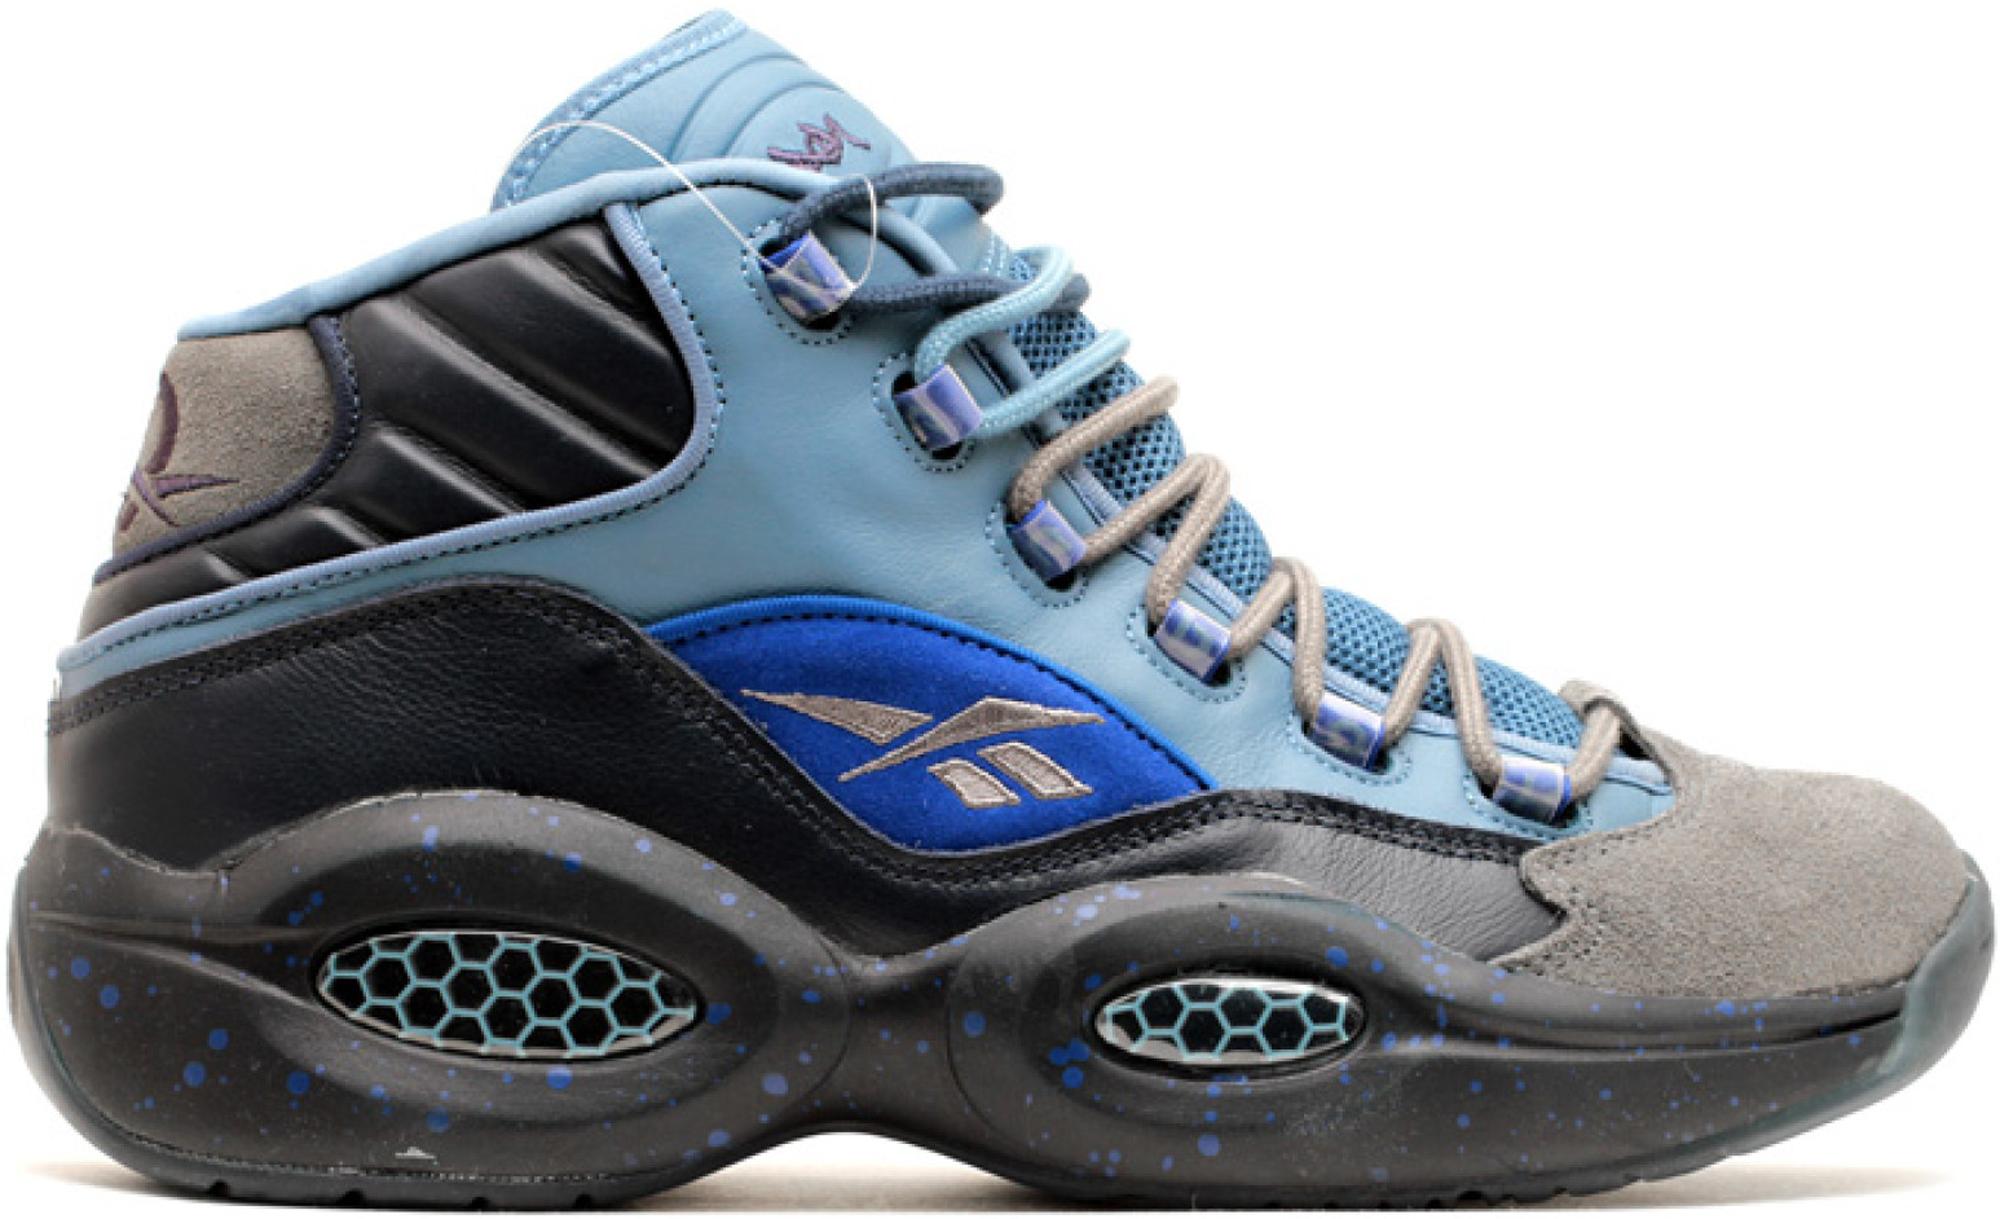 Reebok Mens Question Mid Stash//Grey-Navy-Ultramarine V61041 Shoe